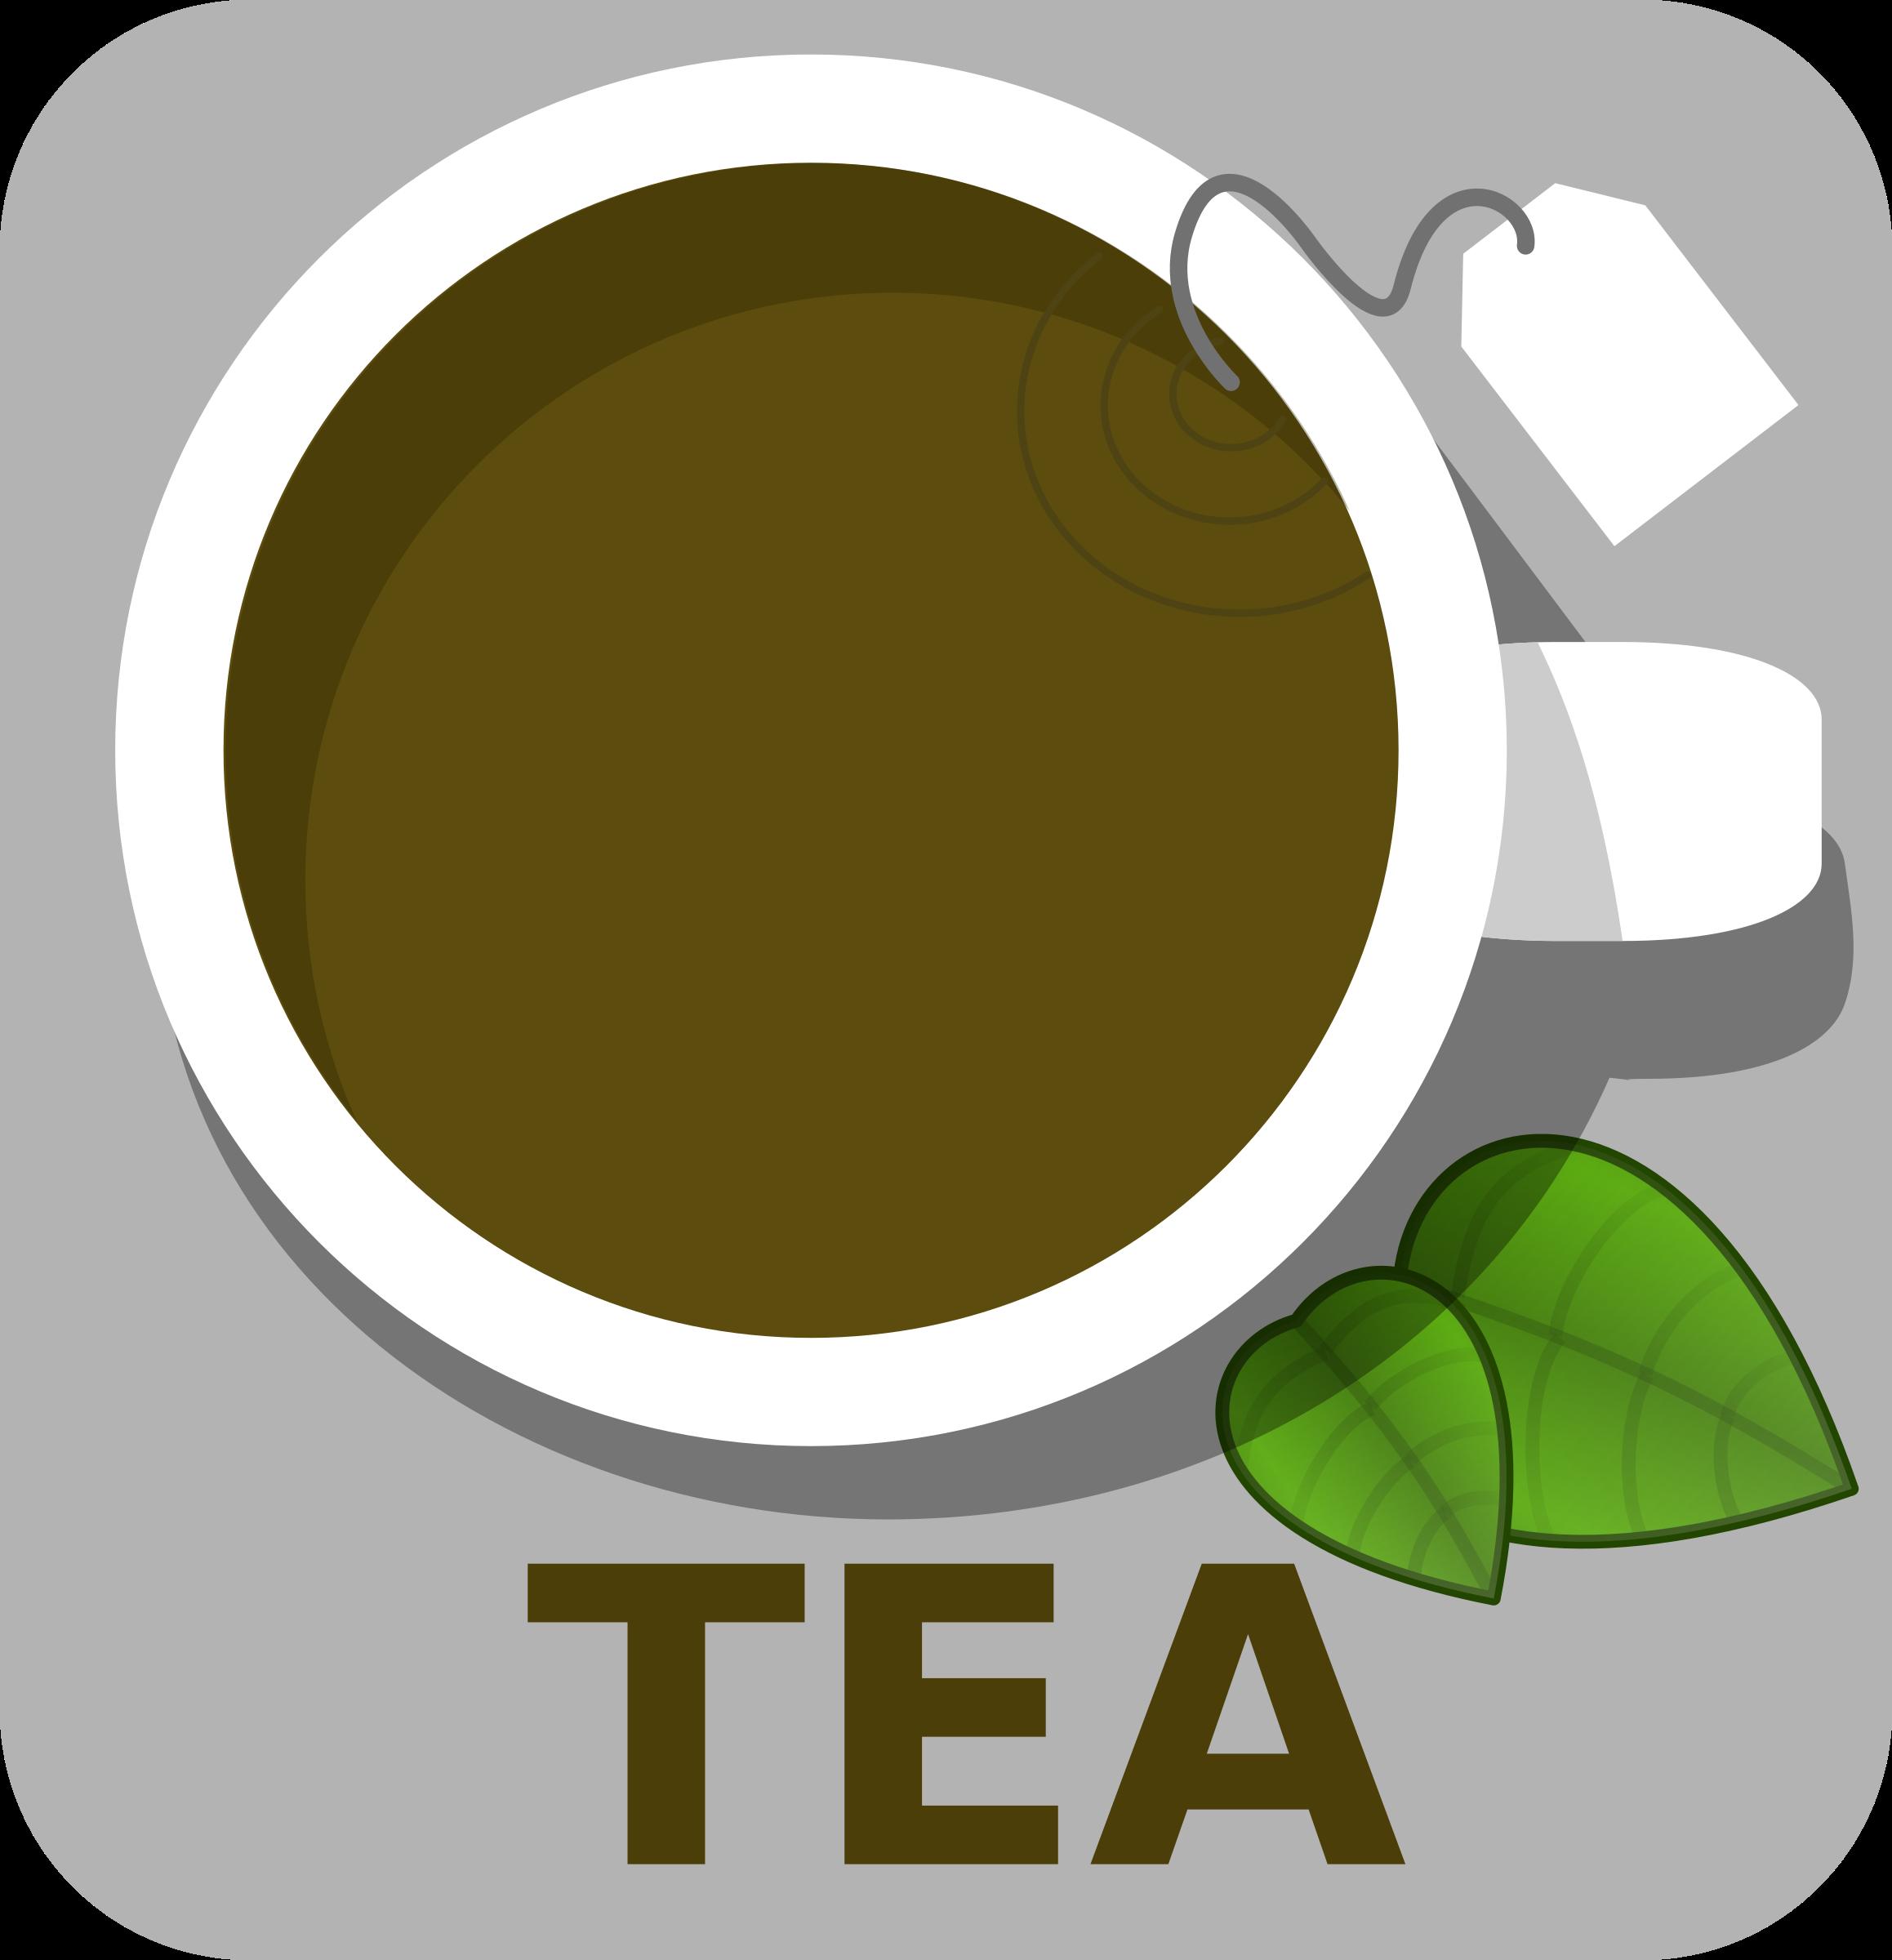 Tea Microsoft Clipart - Clipart Kid